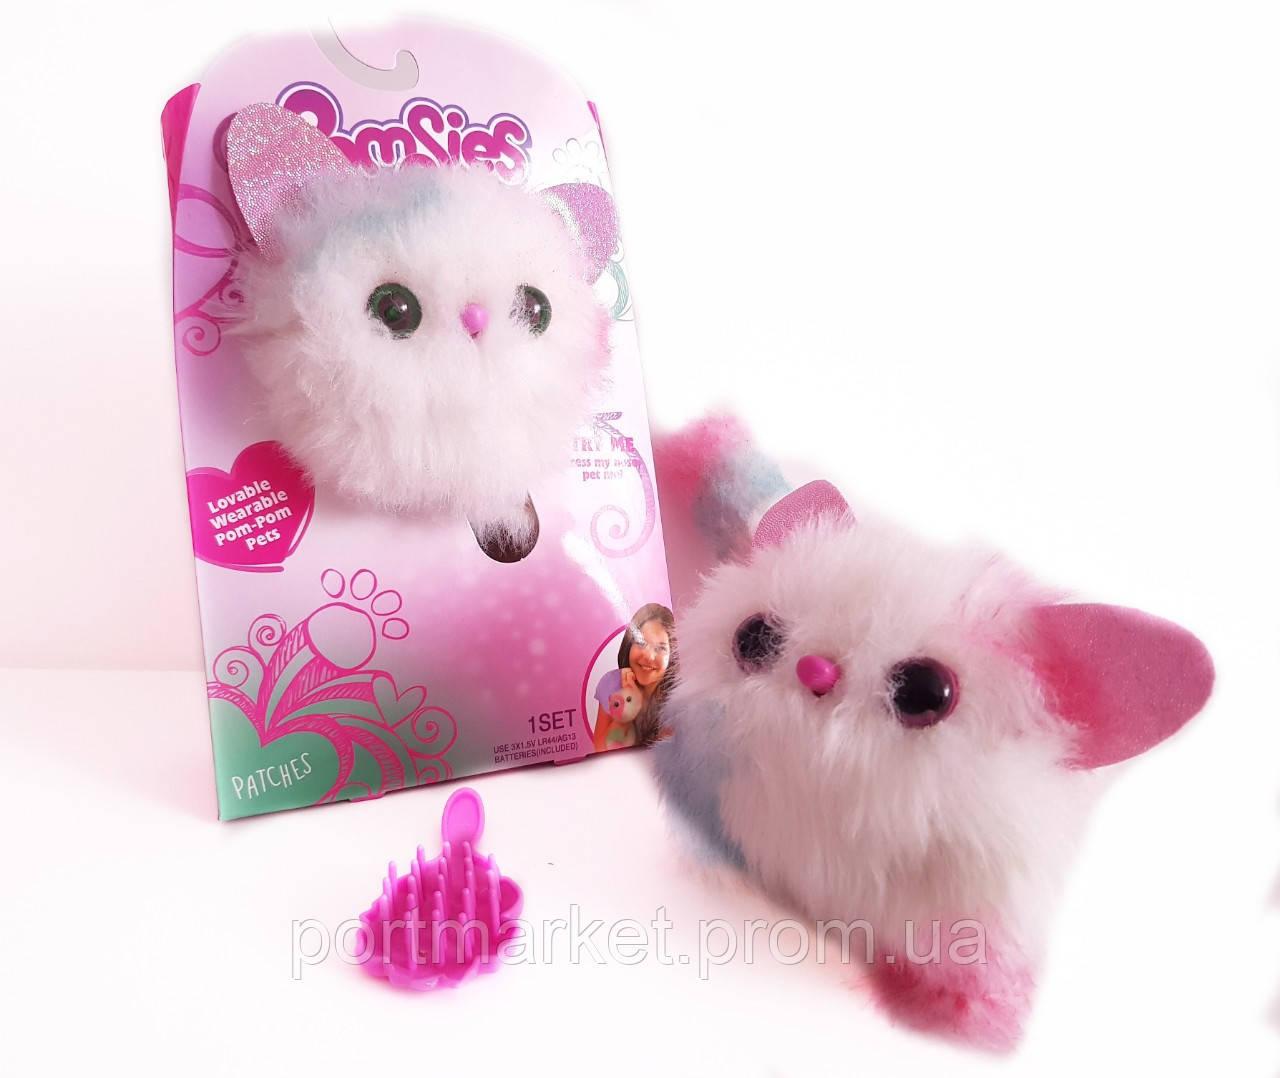 Интерактивная кошка  Помсиз Pomsies (копия)